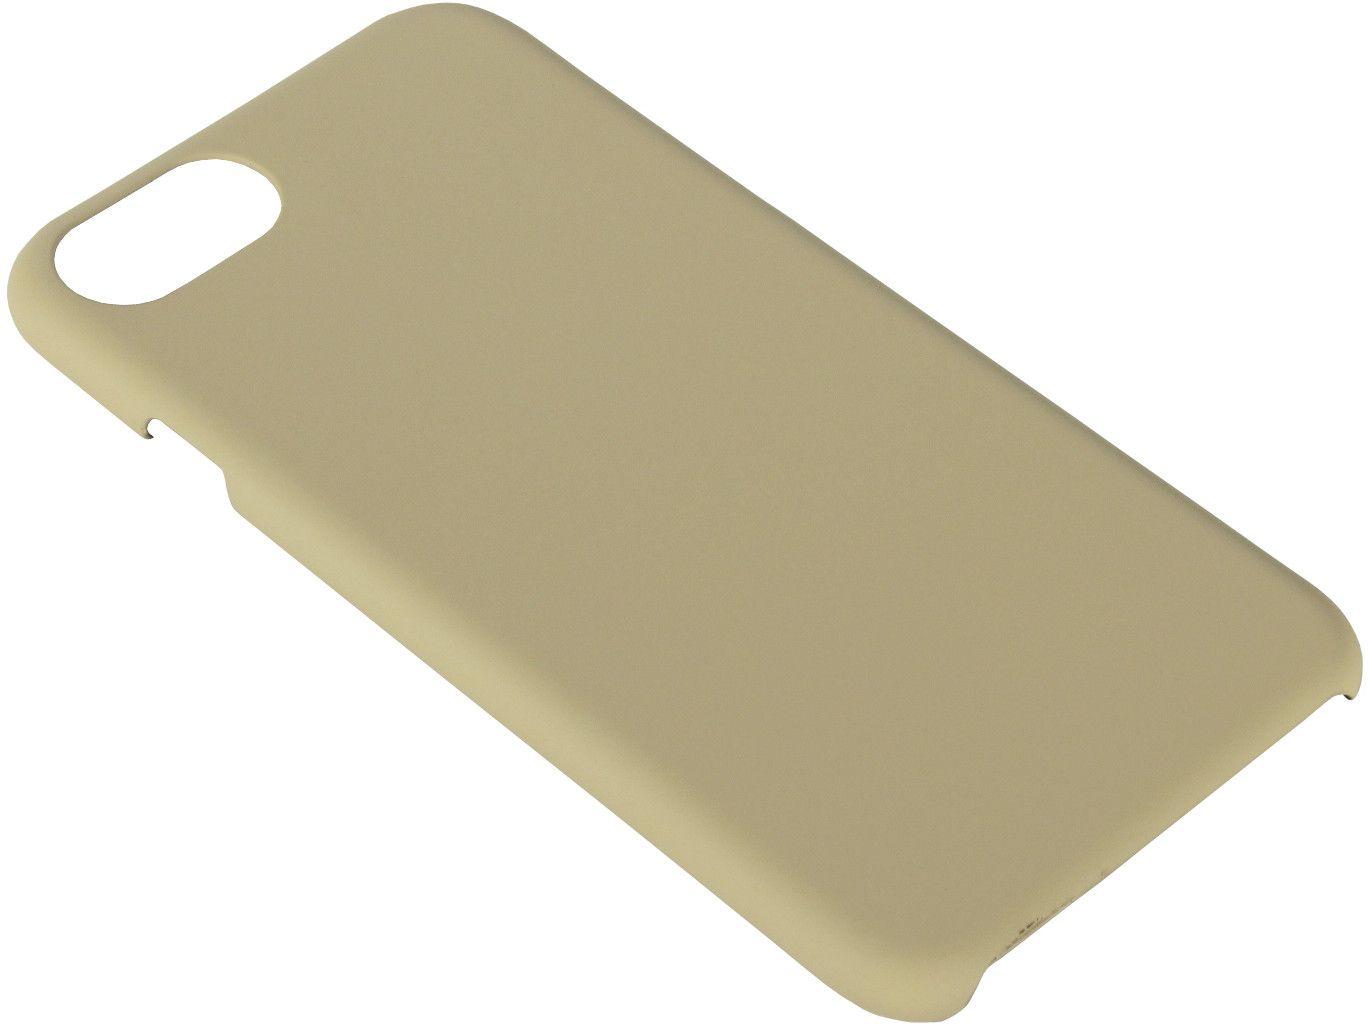 Gear Hard Case (iPhone SE2/8/7/6/6S) - Beige